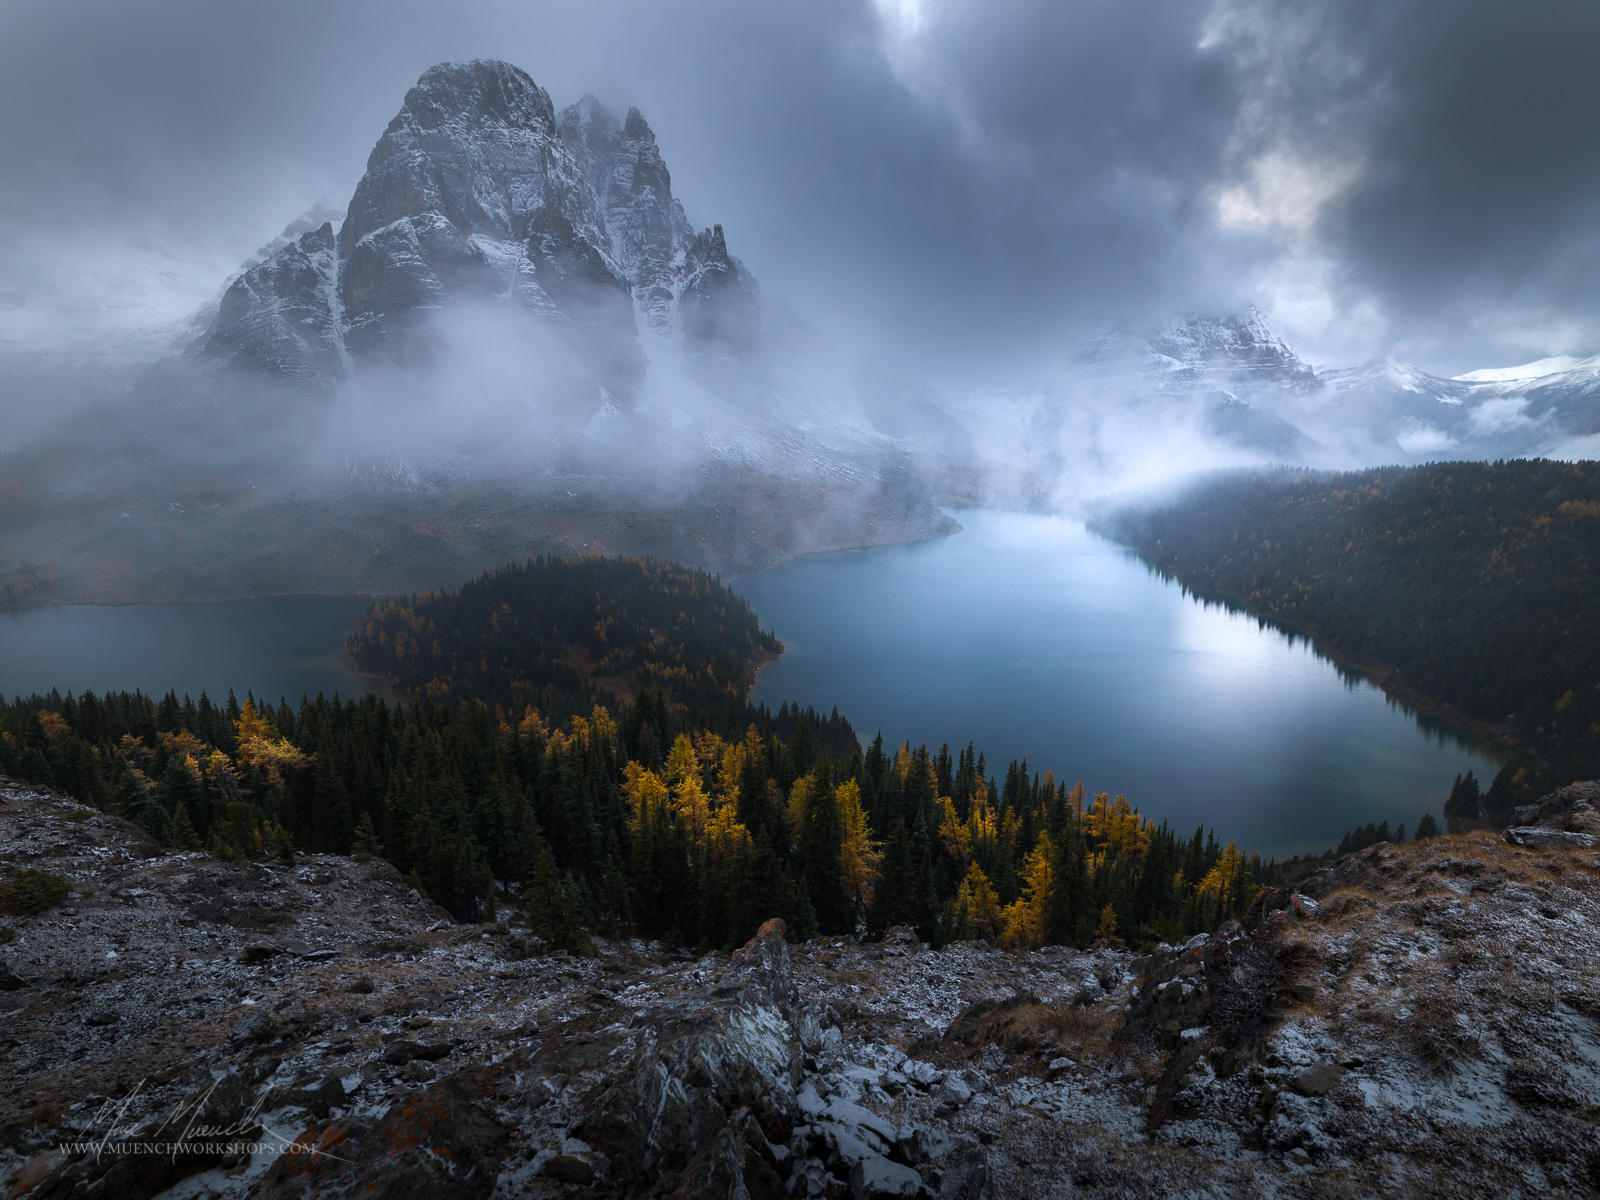 Sunburst Peak, Mount Assiniboine Provincial Park, Canada.   (4x3)